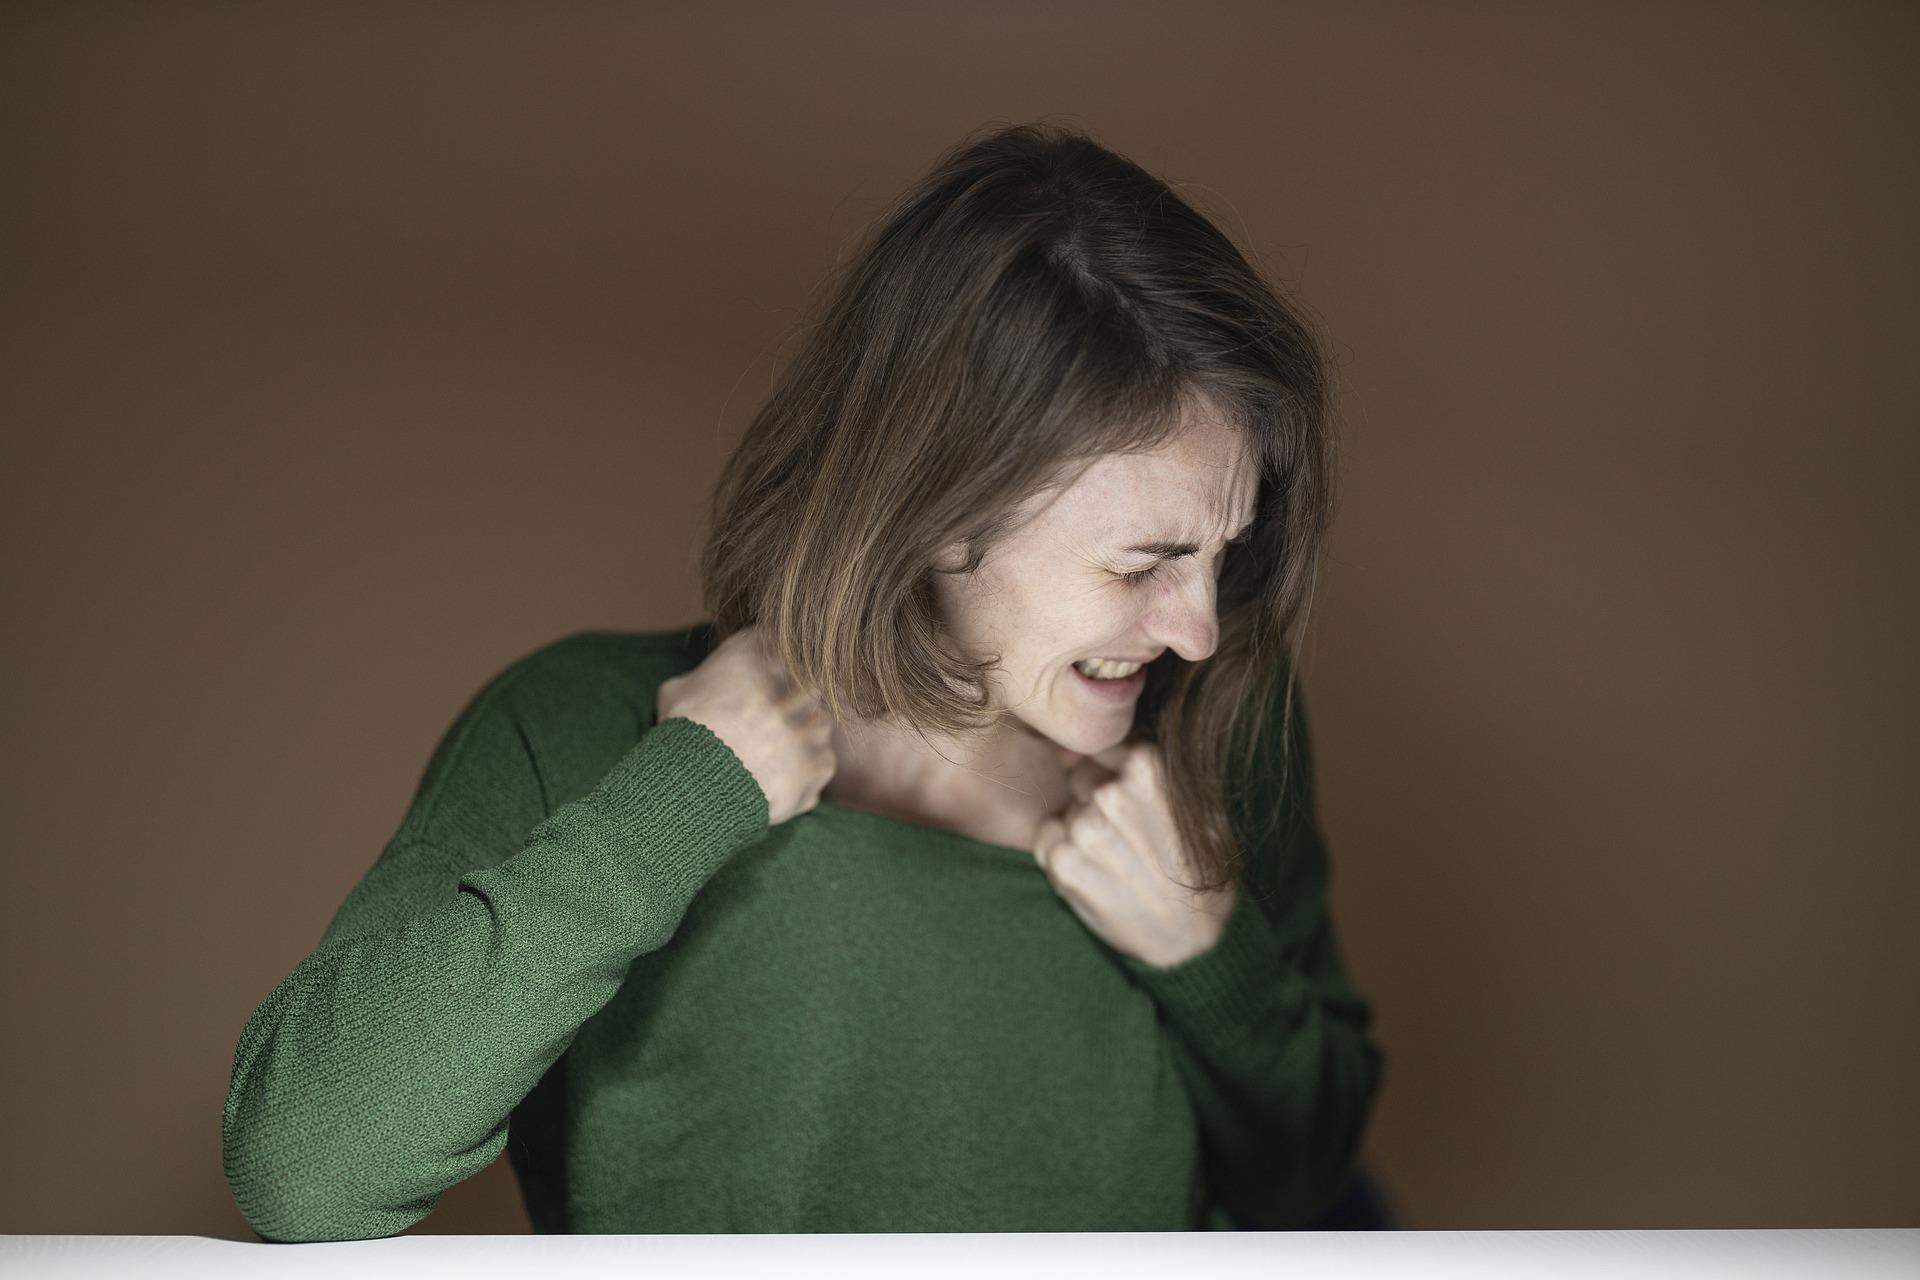 Mengatasi Suami yang Tidak Teratur